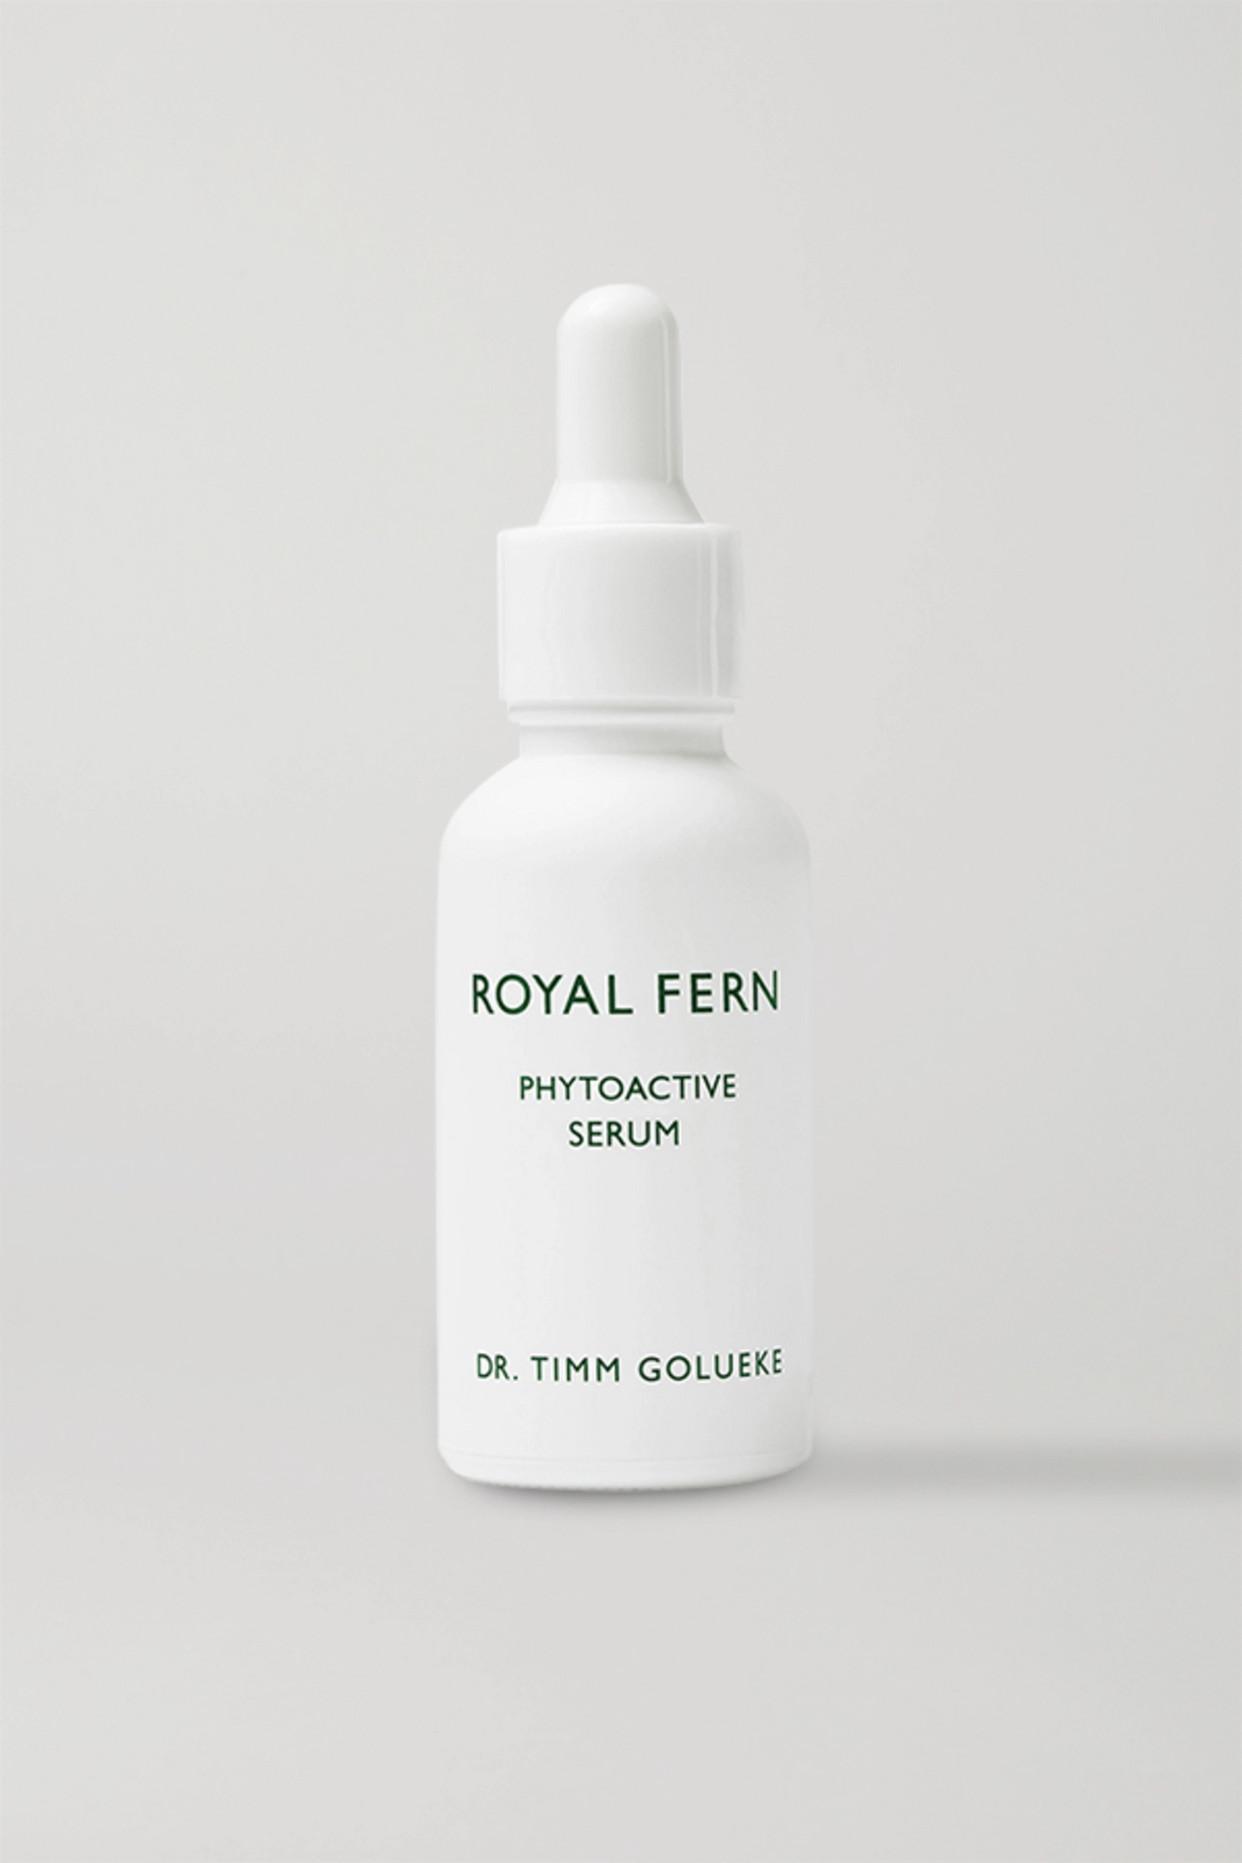 ROYAL FERN - Phytoactive Serum, 30ml - one size